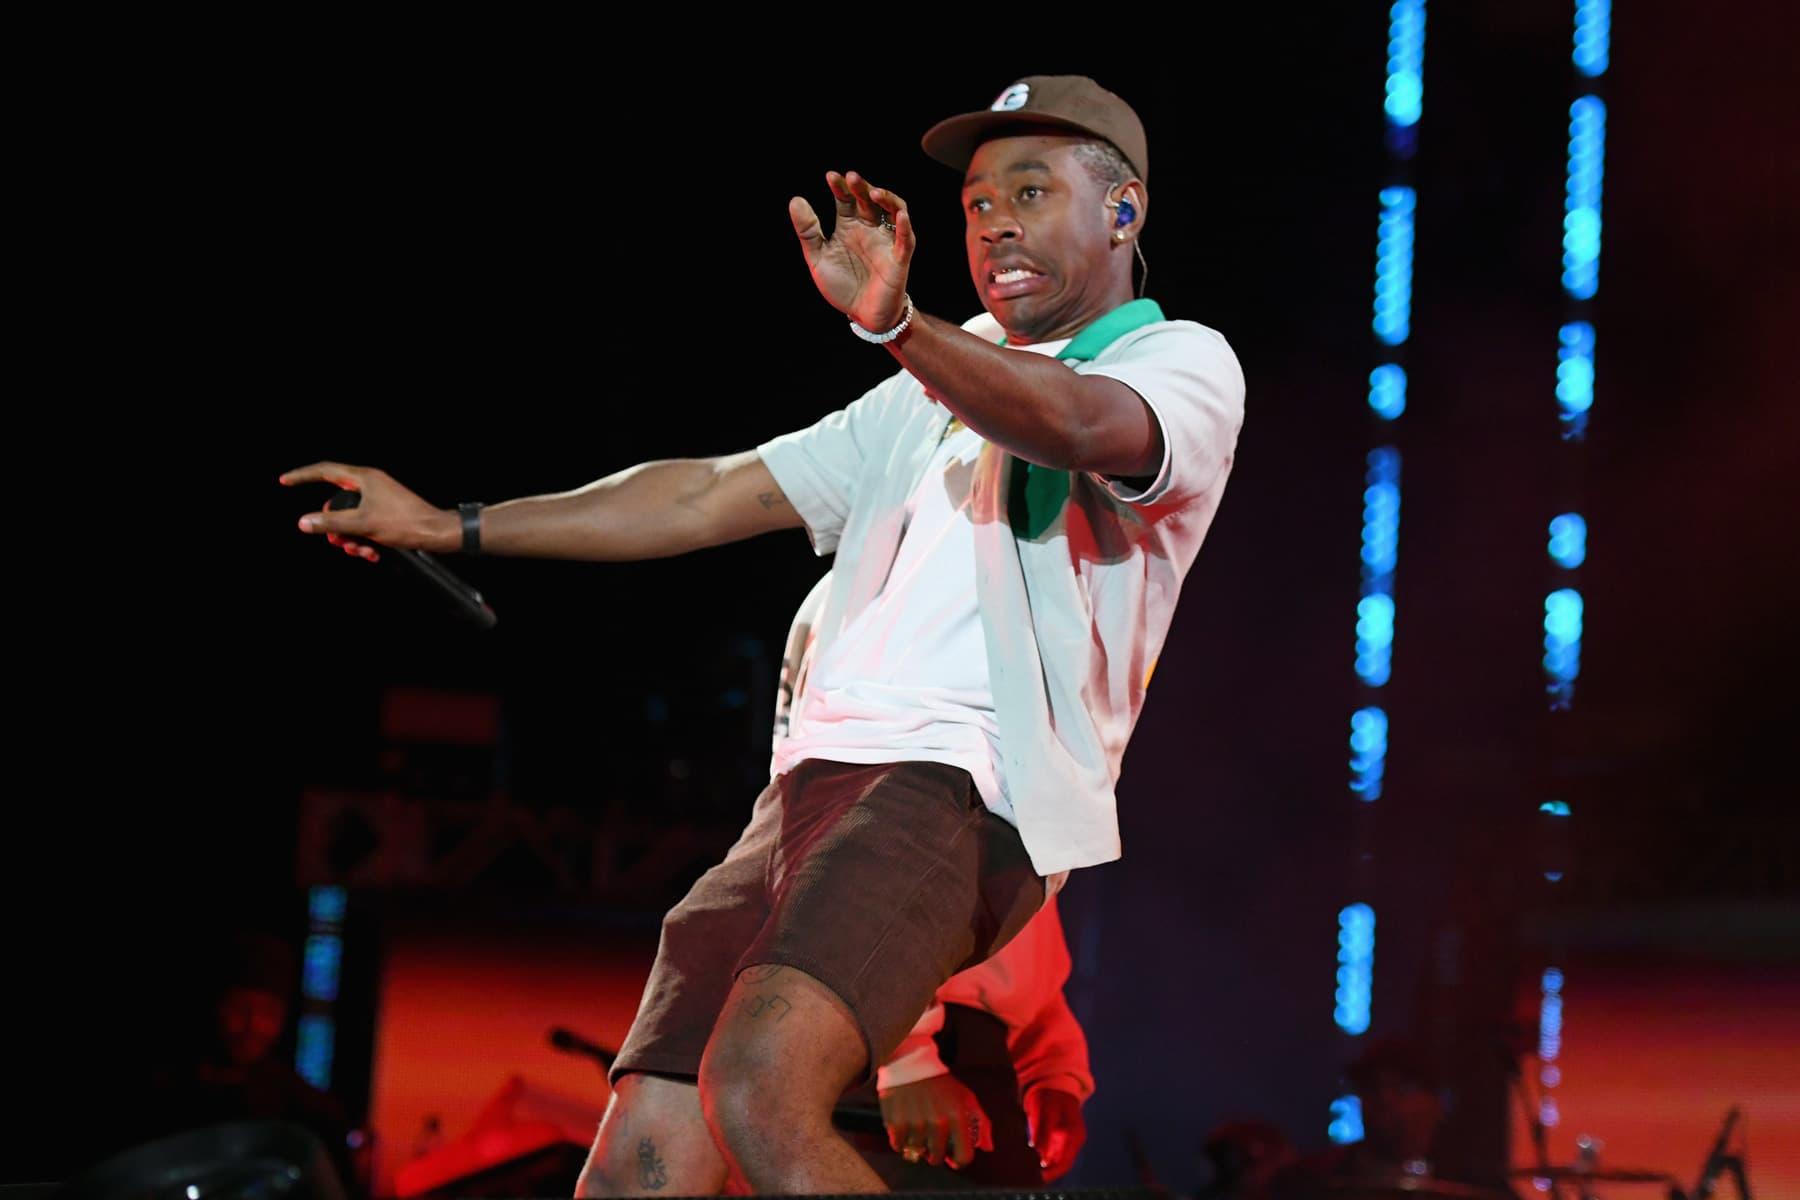 Watch Tyler, The Creator Perform 'IGOR' in Full